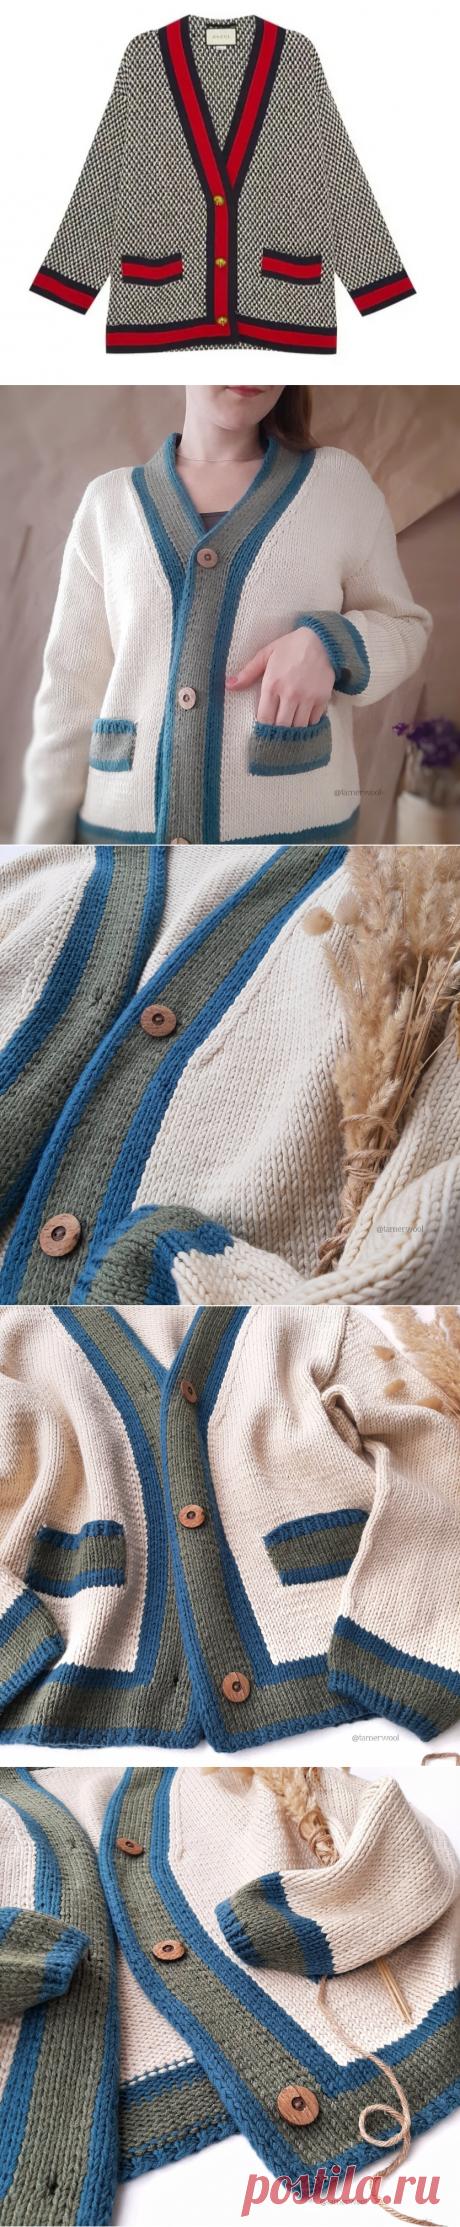 Кардиган спицами с элементами интарсии. Описание модели. | Вязание красиво. Tamerwool | Яндекс Дзен